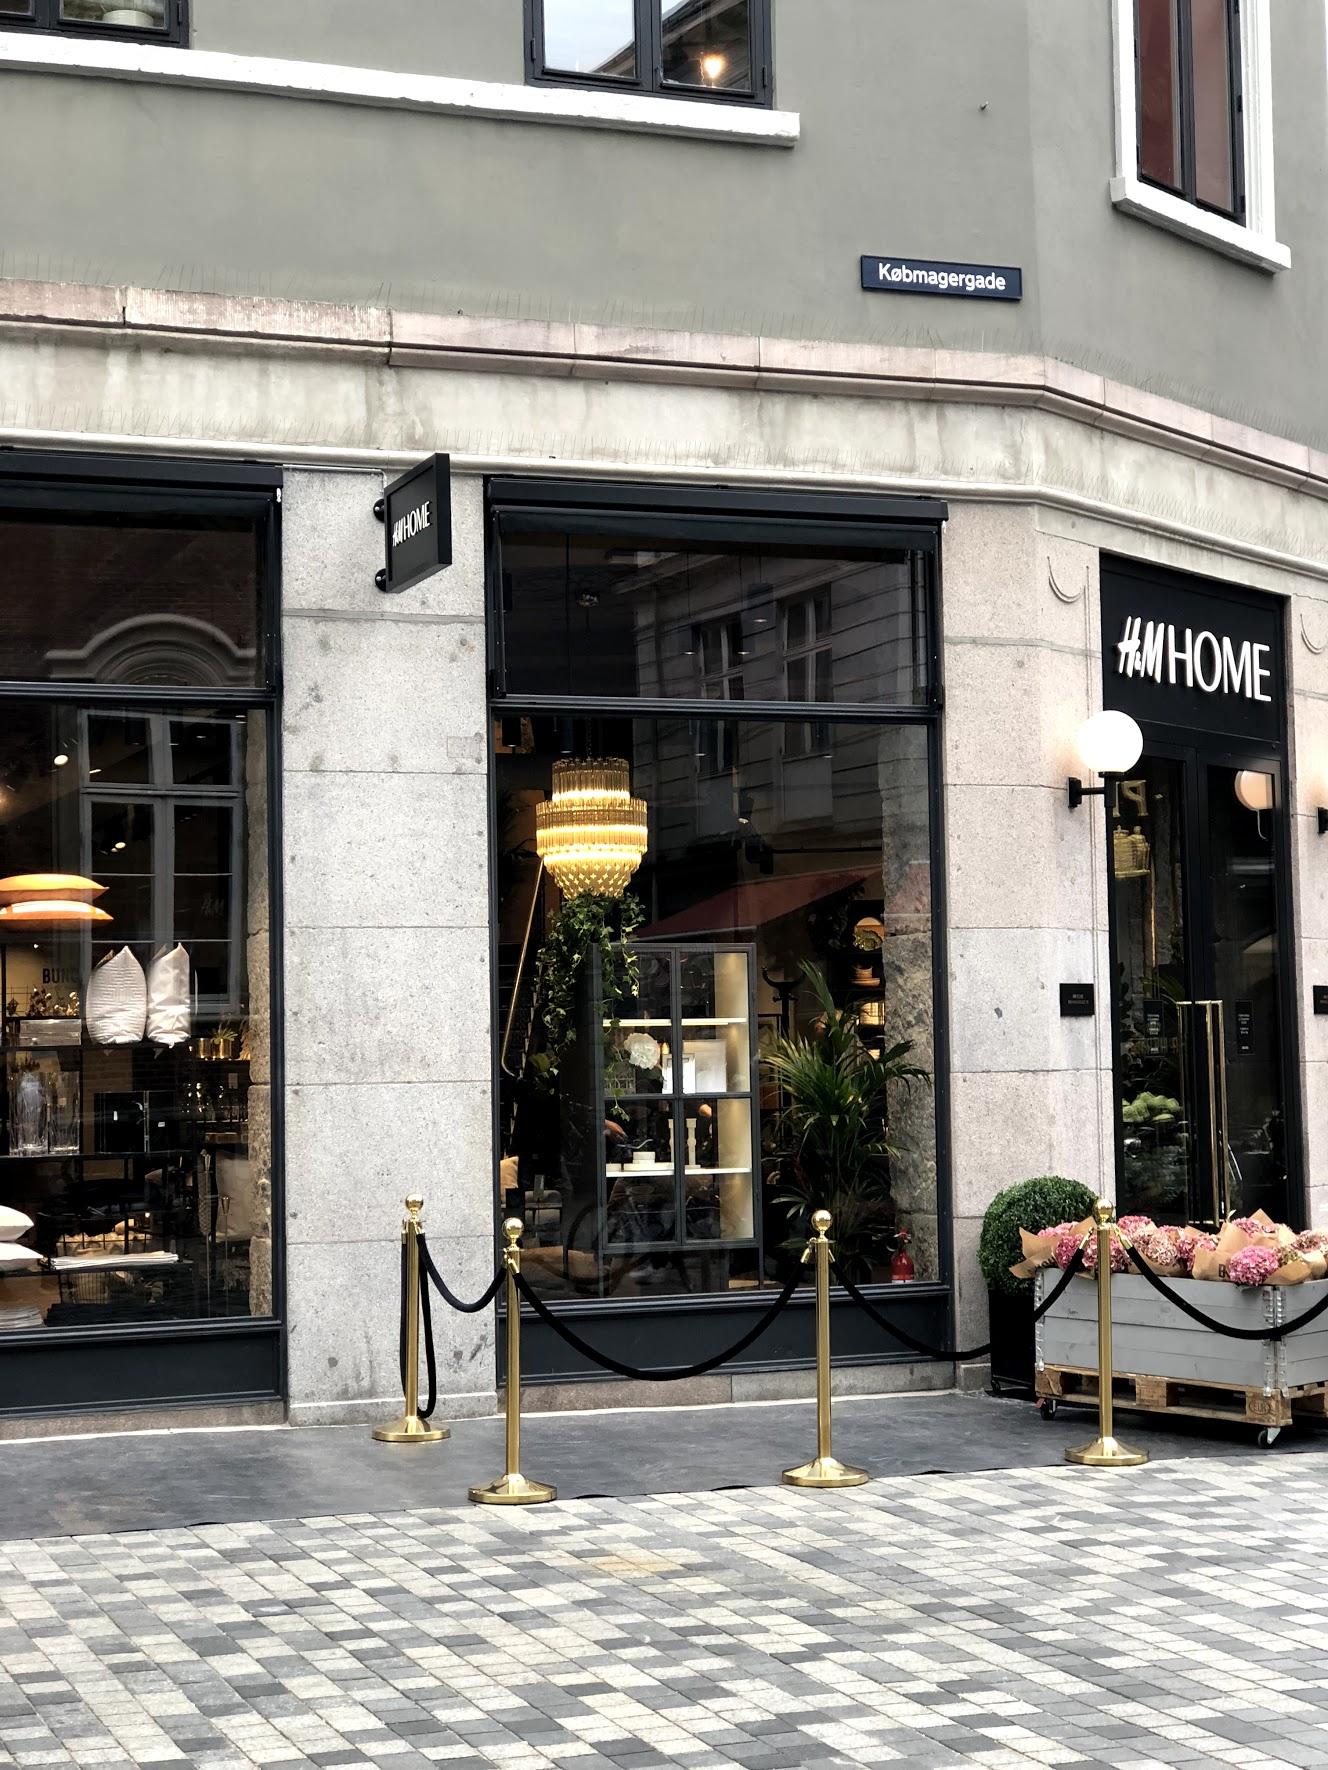 The New Hm Home Concept Store In Copenhagen September Edit